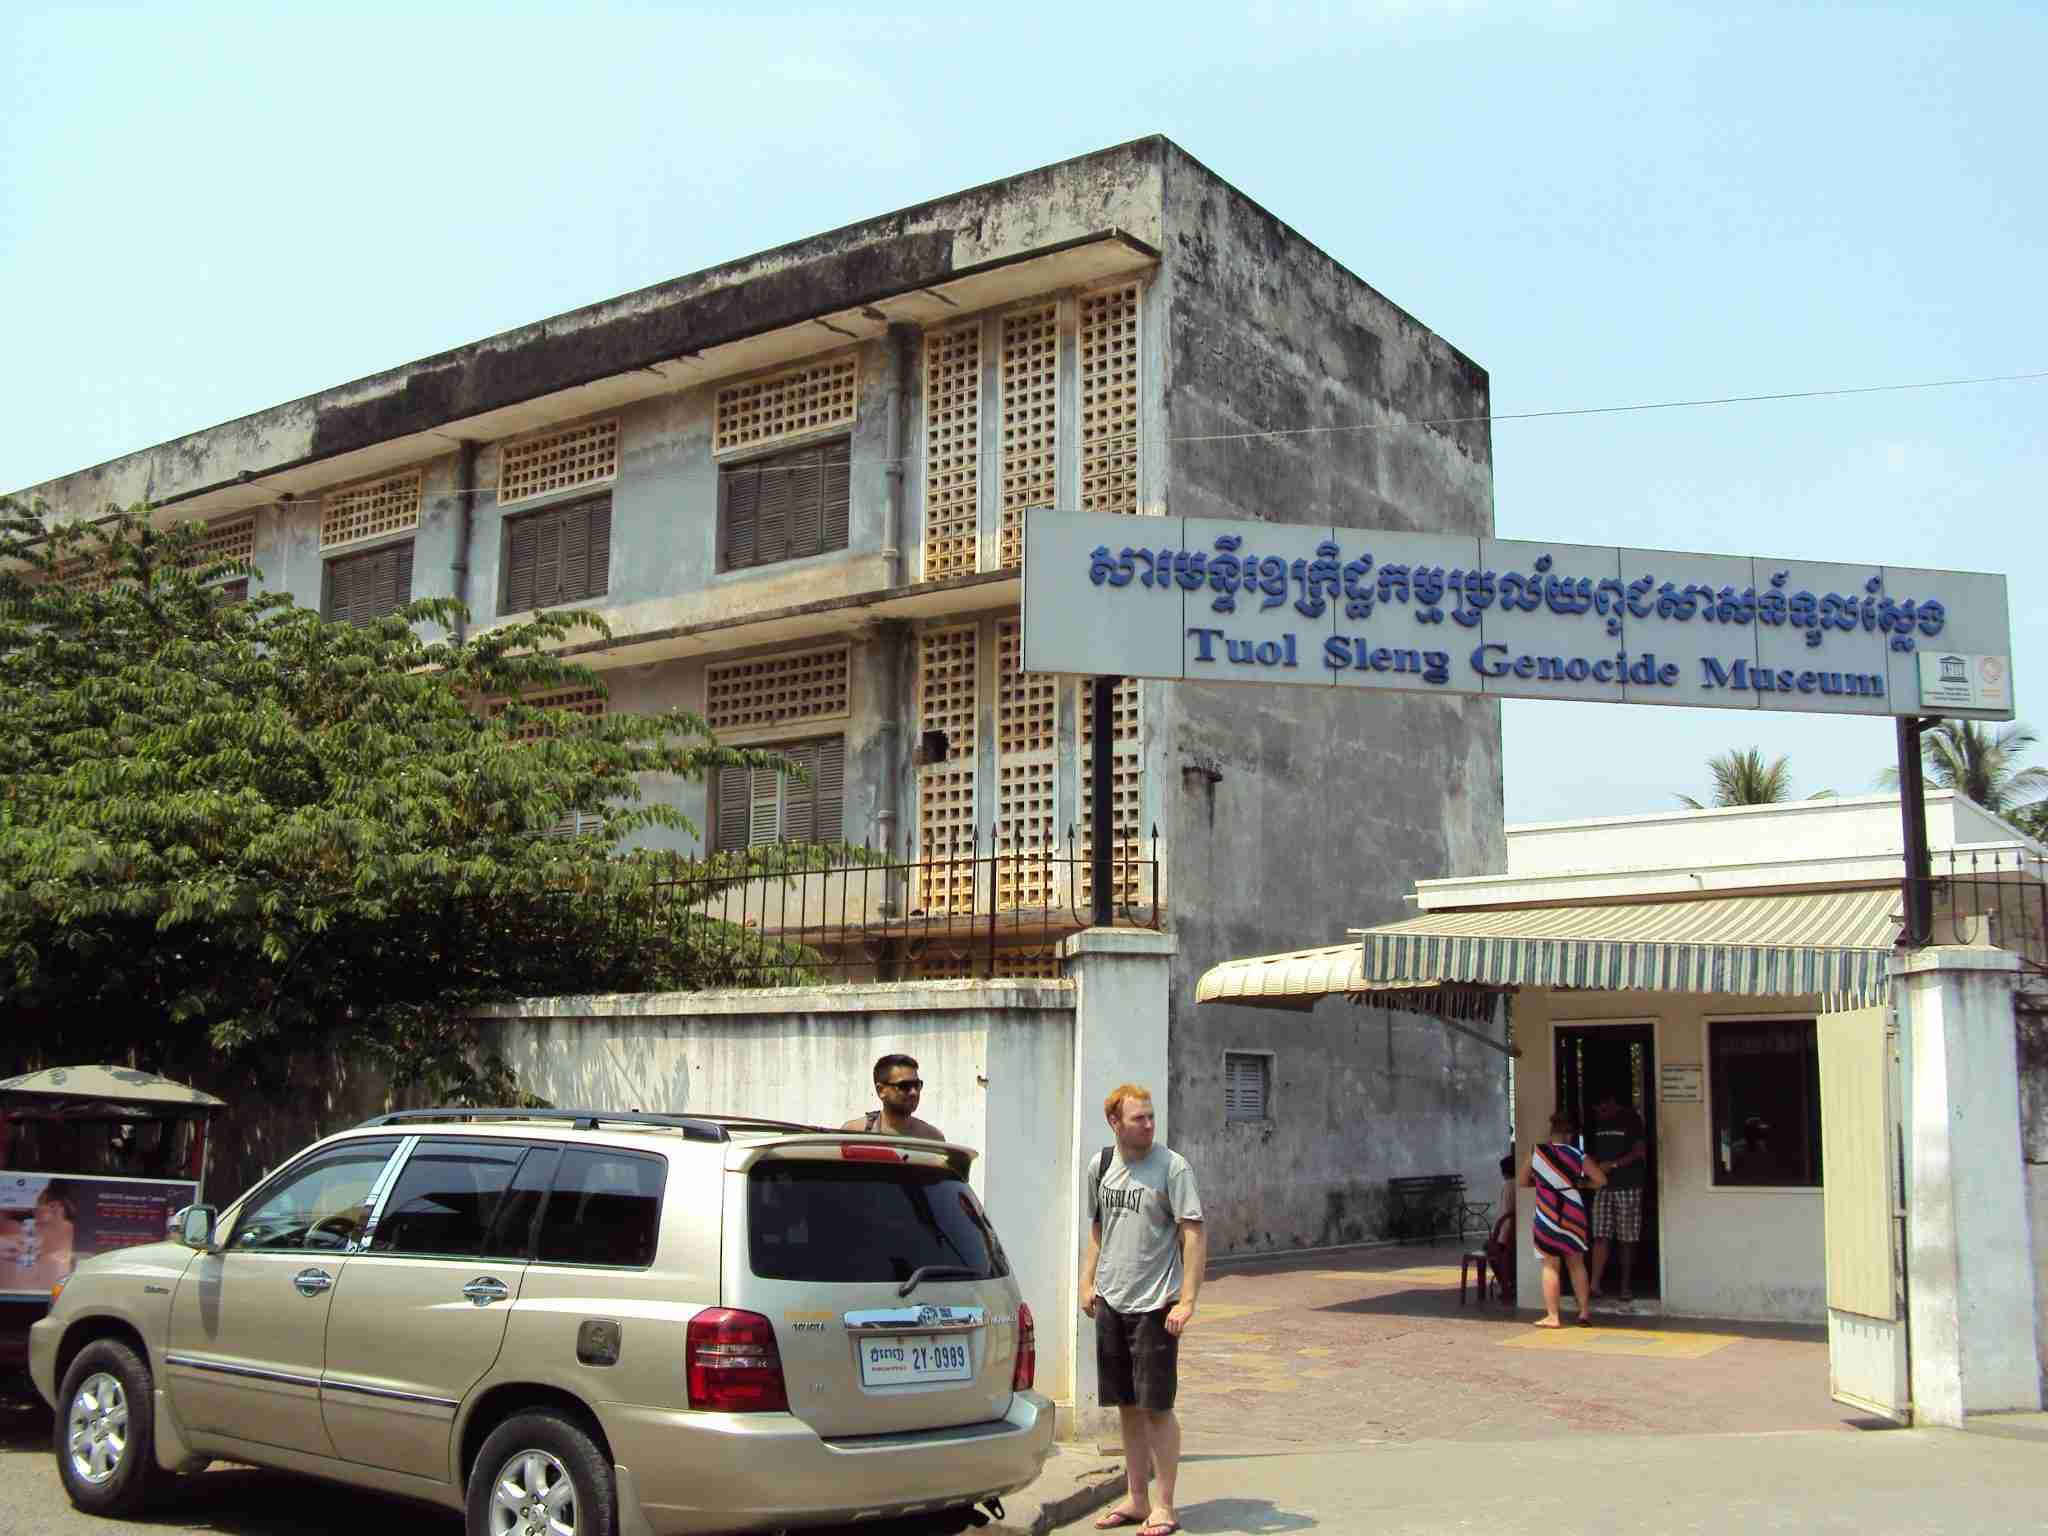 The Tuol Sleng Genozide Museum in Phnom Penh